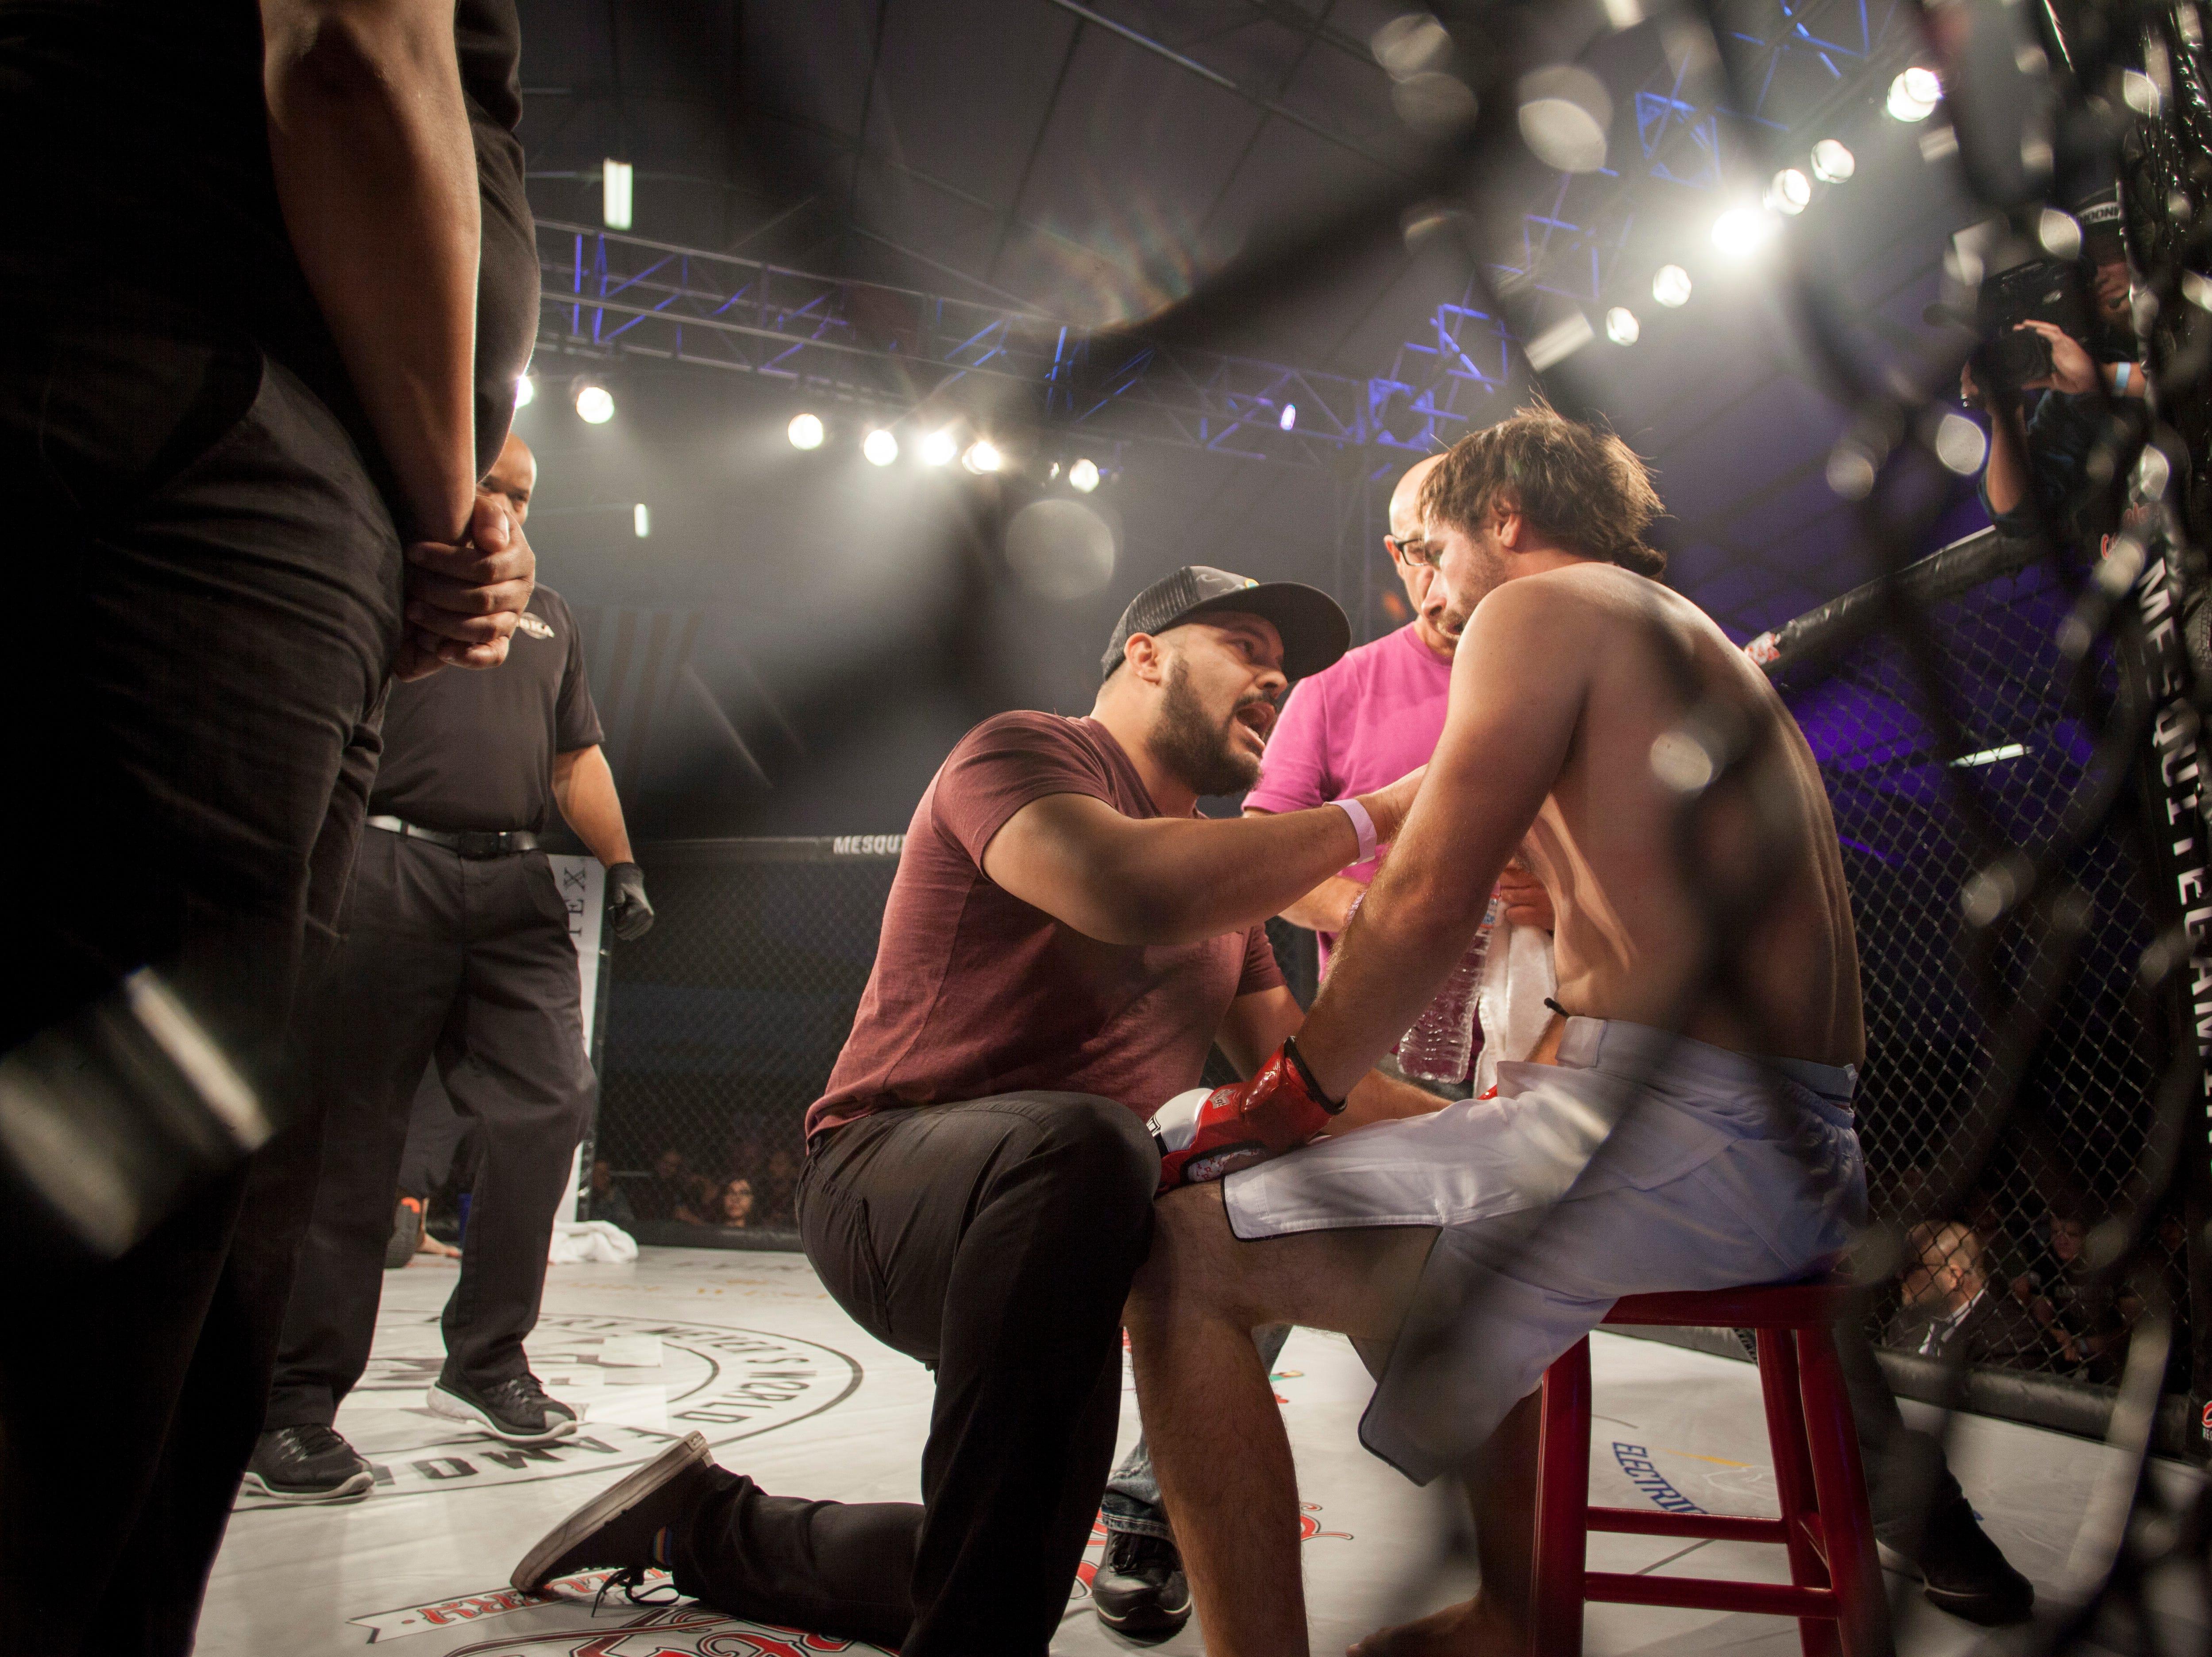 Brandon Honsvick, in the blue corner, defeats Tylor Kates during Mayhem in Mesquite at the Casablanca Saturday, Dec. 15, 2018.